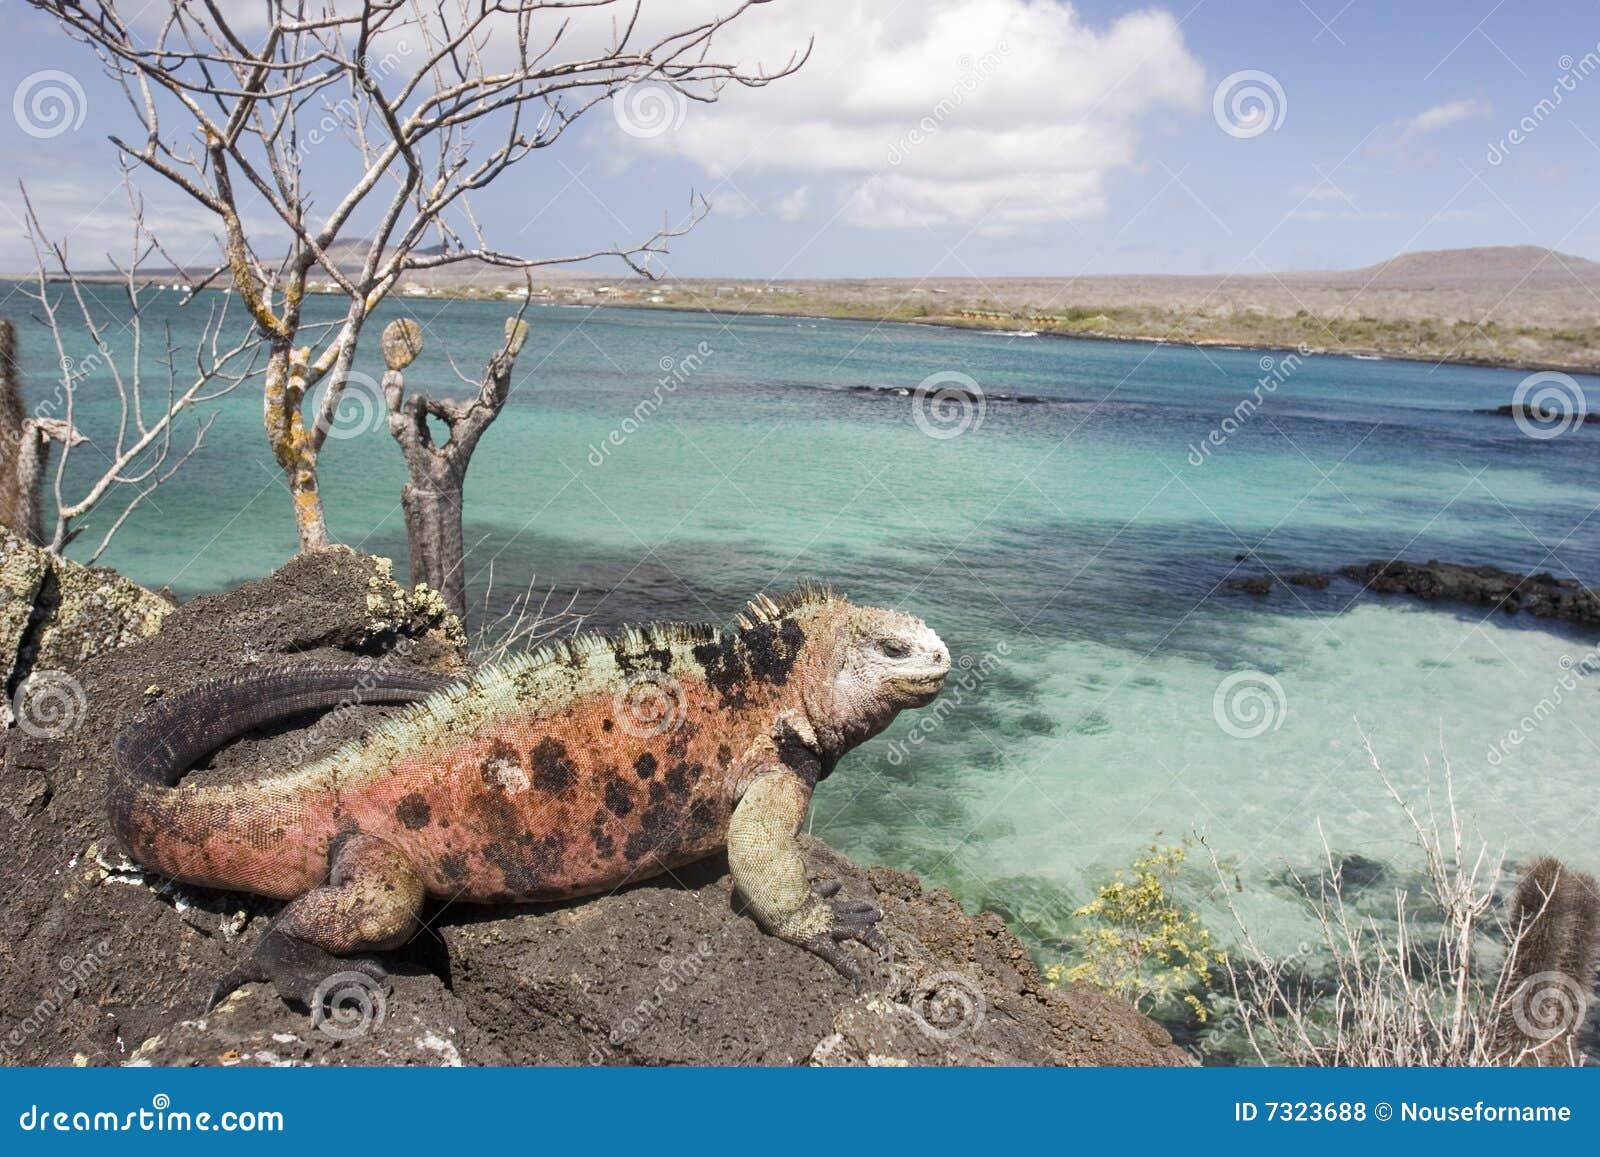 Iguana on Floriana island